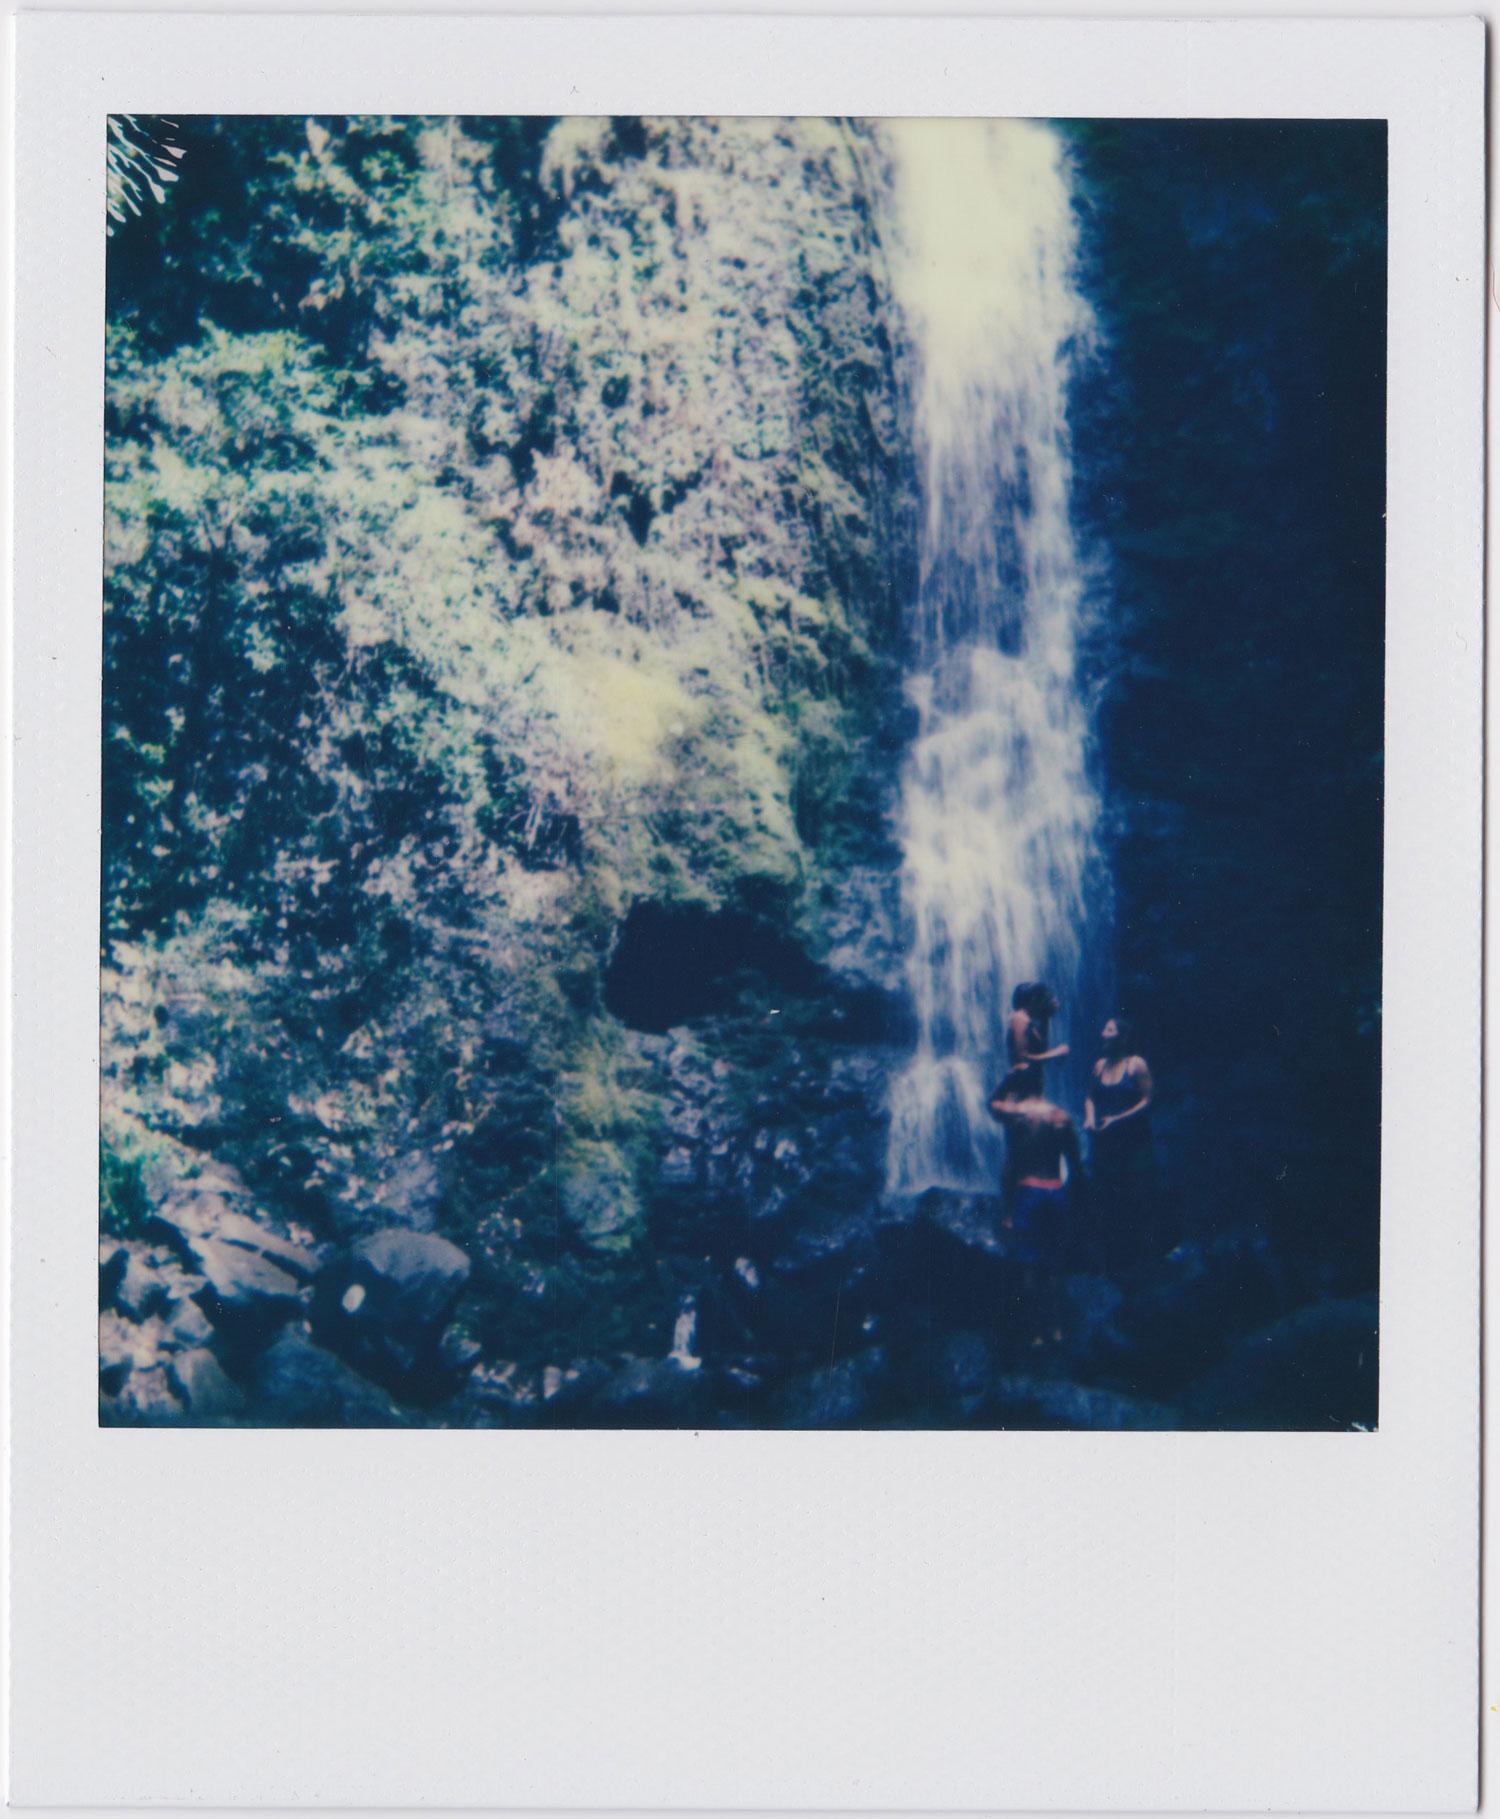 whoiscx_christina_choi_photography_polaroid_film_hawaii_waterfall_10.jpg